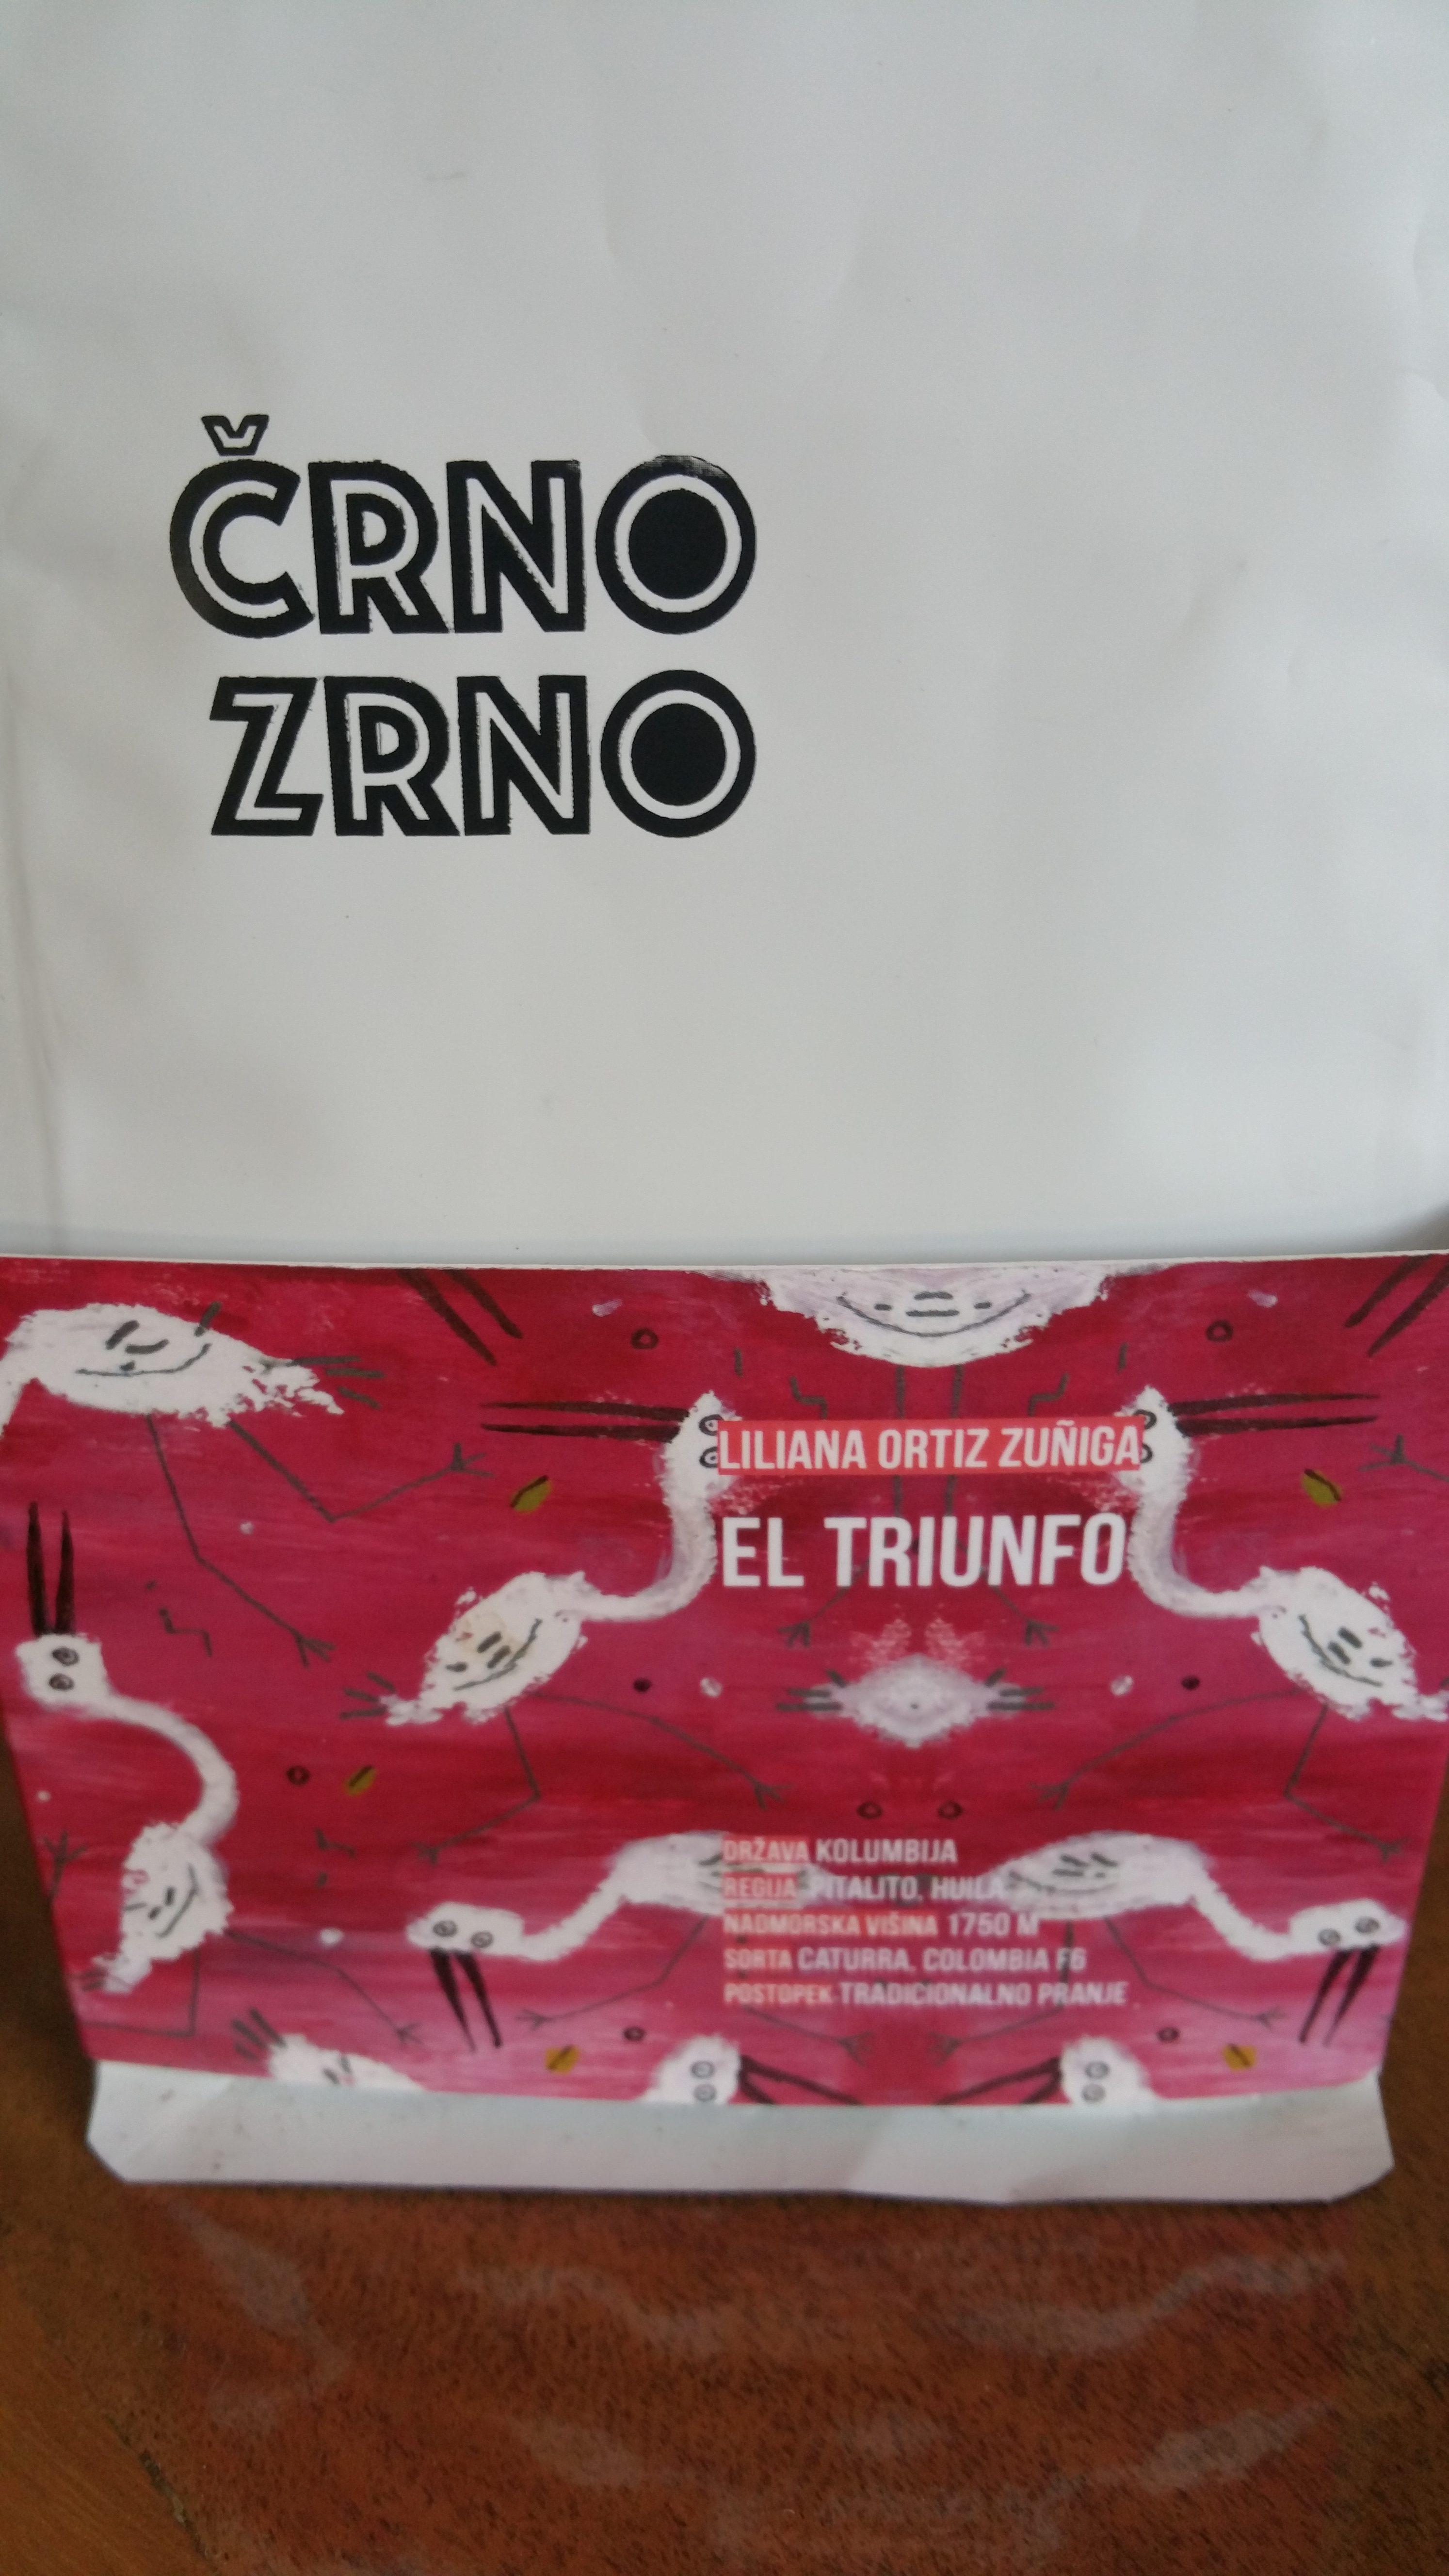 El Triunfo wrapping